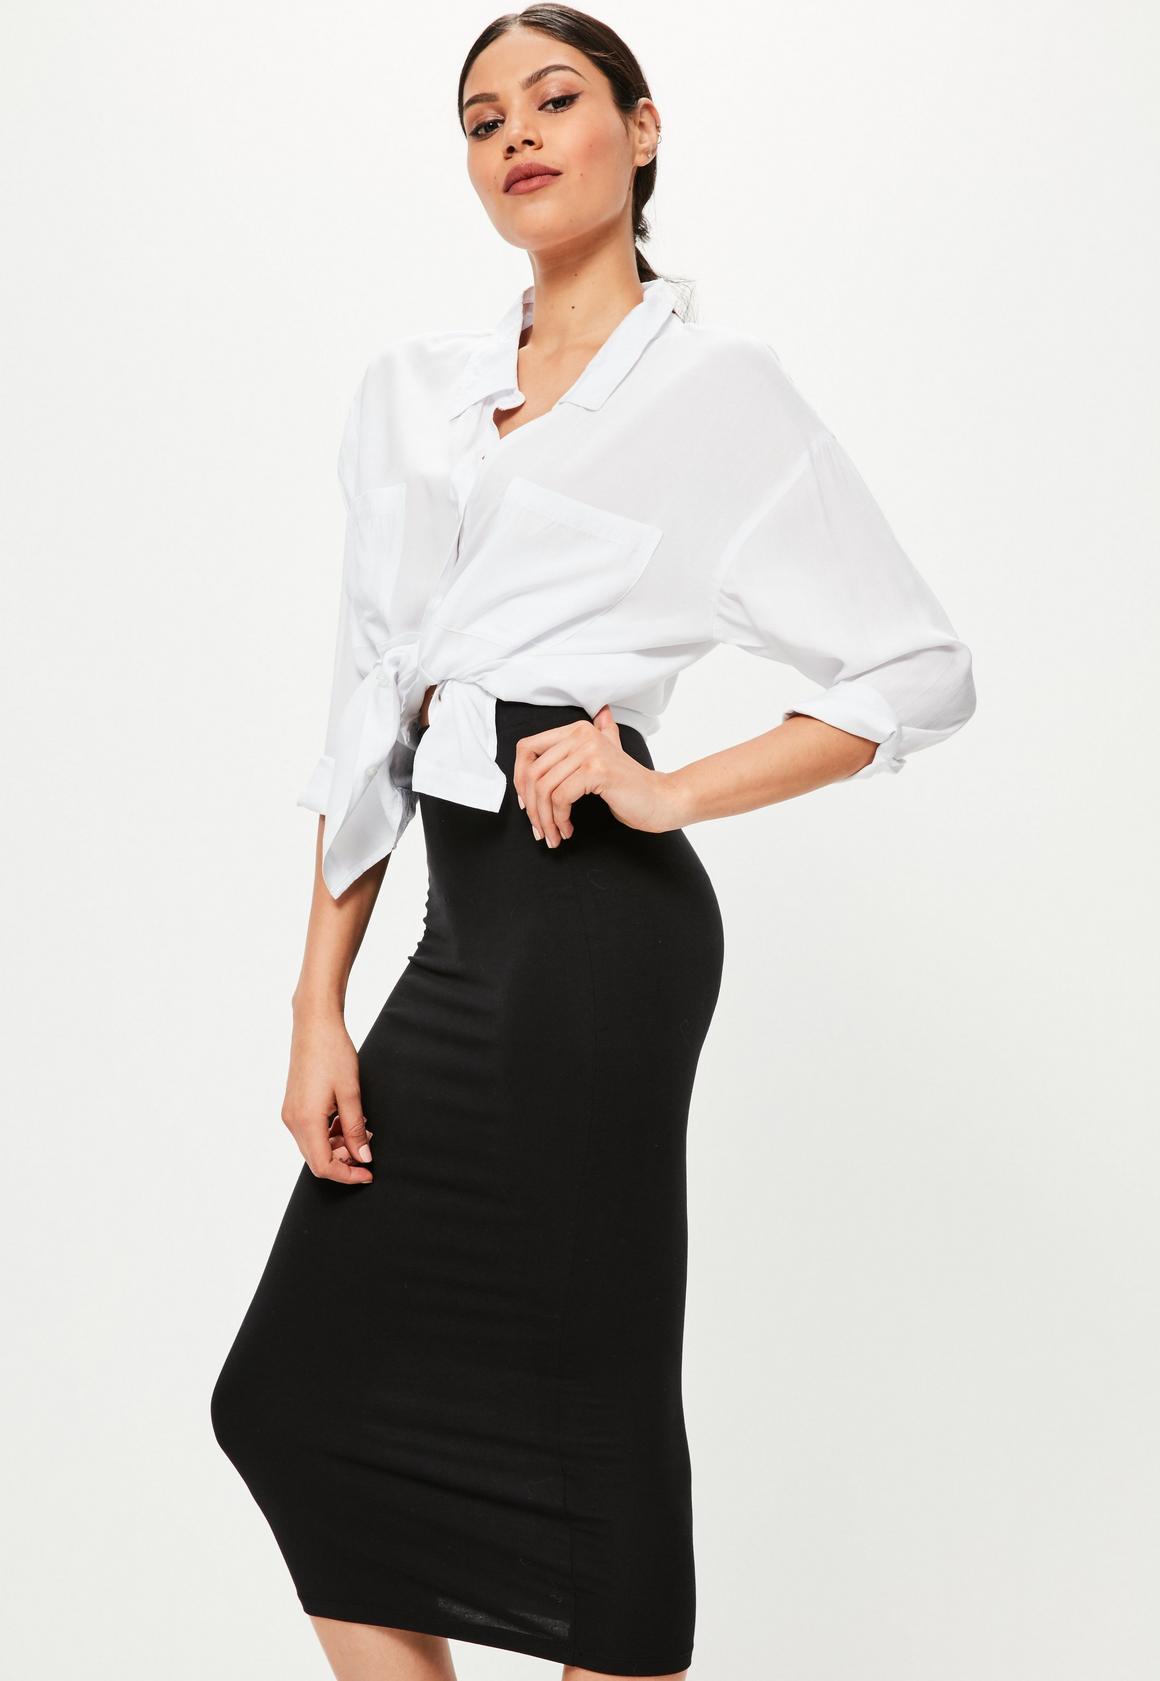 Midi Skirts | Women's Calf Length Skirts - Missguided